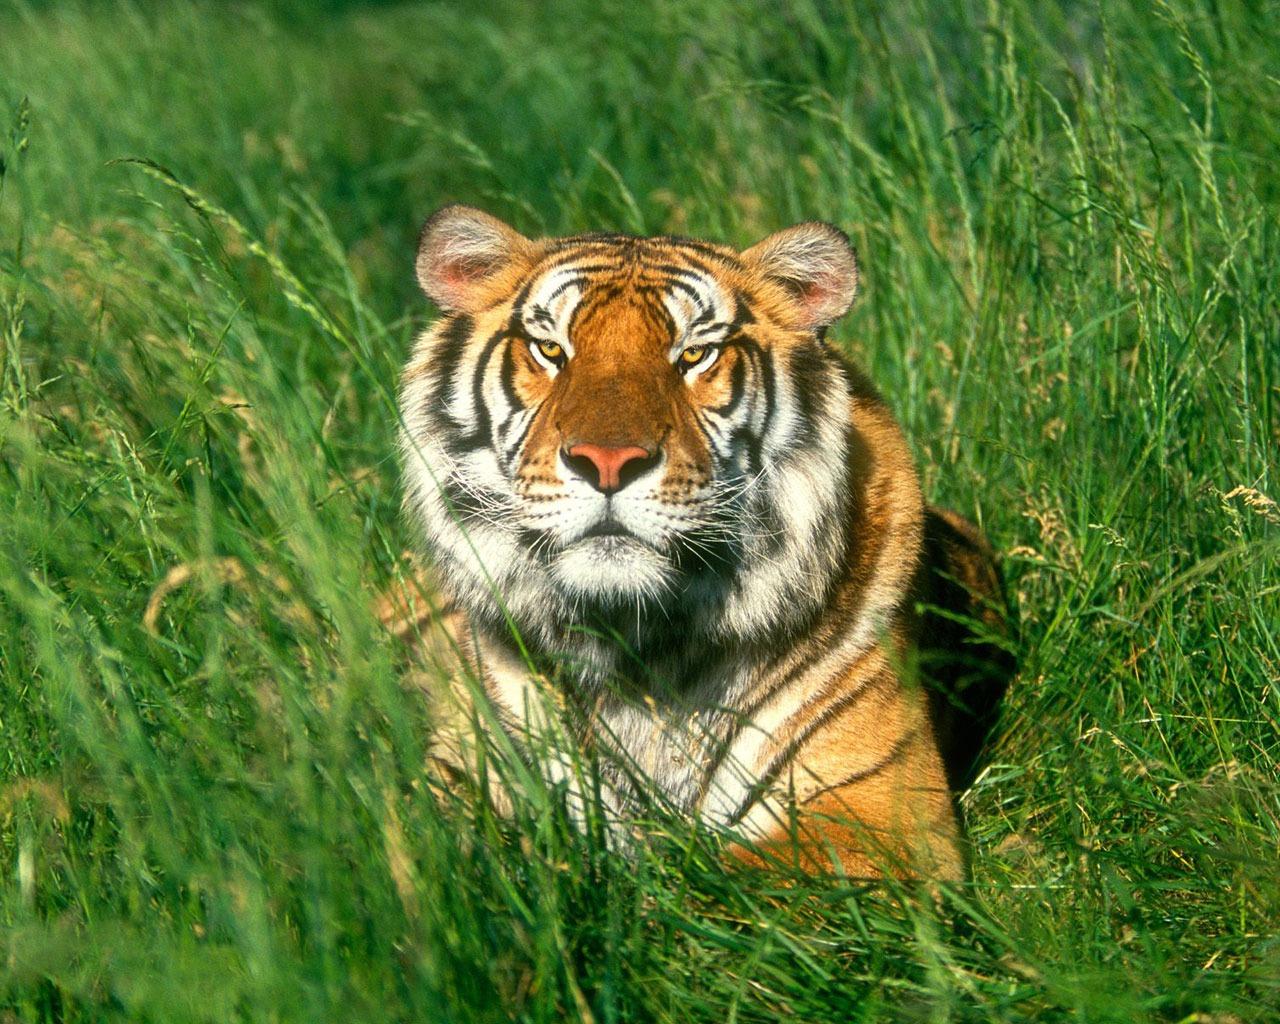 sunbather bengal tiger wallpaper tigers animals wallpapers in jpg